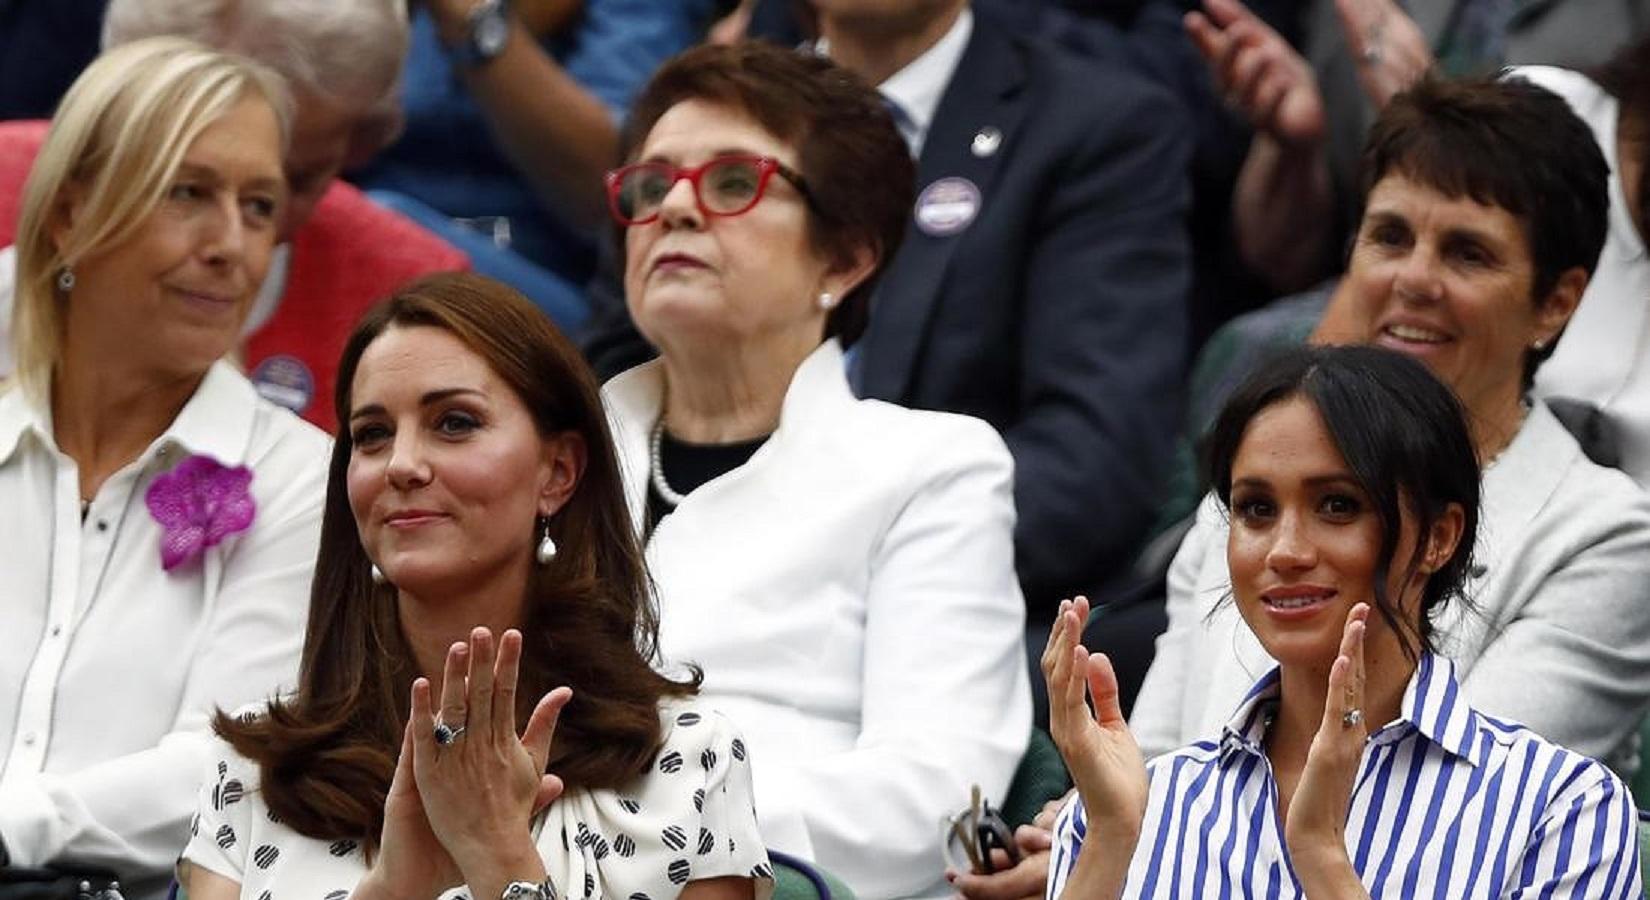 Kate Middleton, no allo shopping con Meghan: il momento imbarazzate